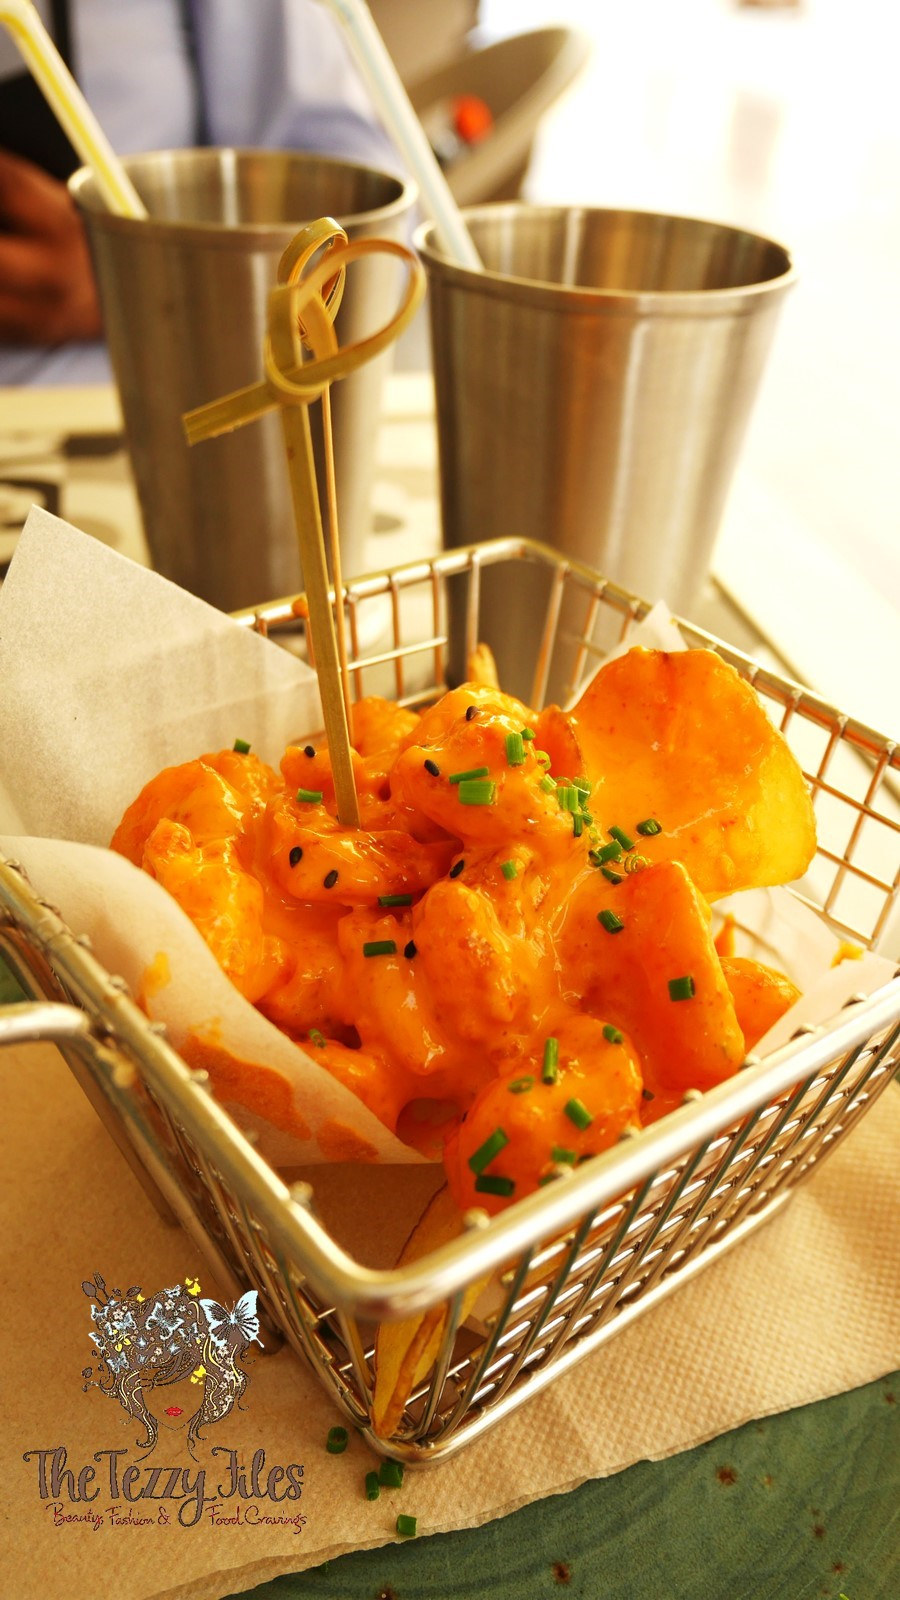 urban-seafood-the-beach-jbr-review-the-tezzy-files-dubai-food-blog-uae-blogger-lobster-shrimps-fast-food-fresh-orange-juice-1